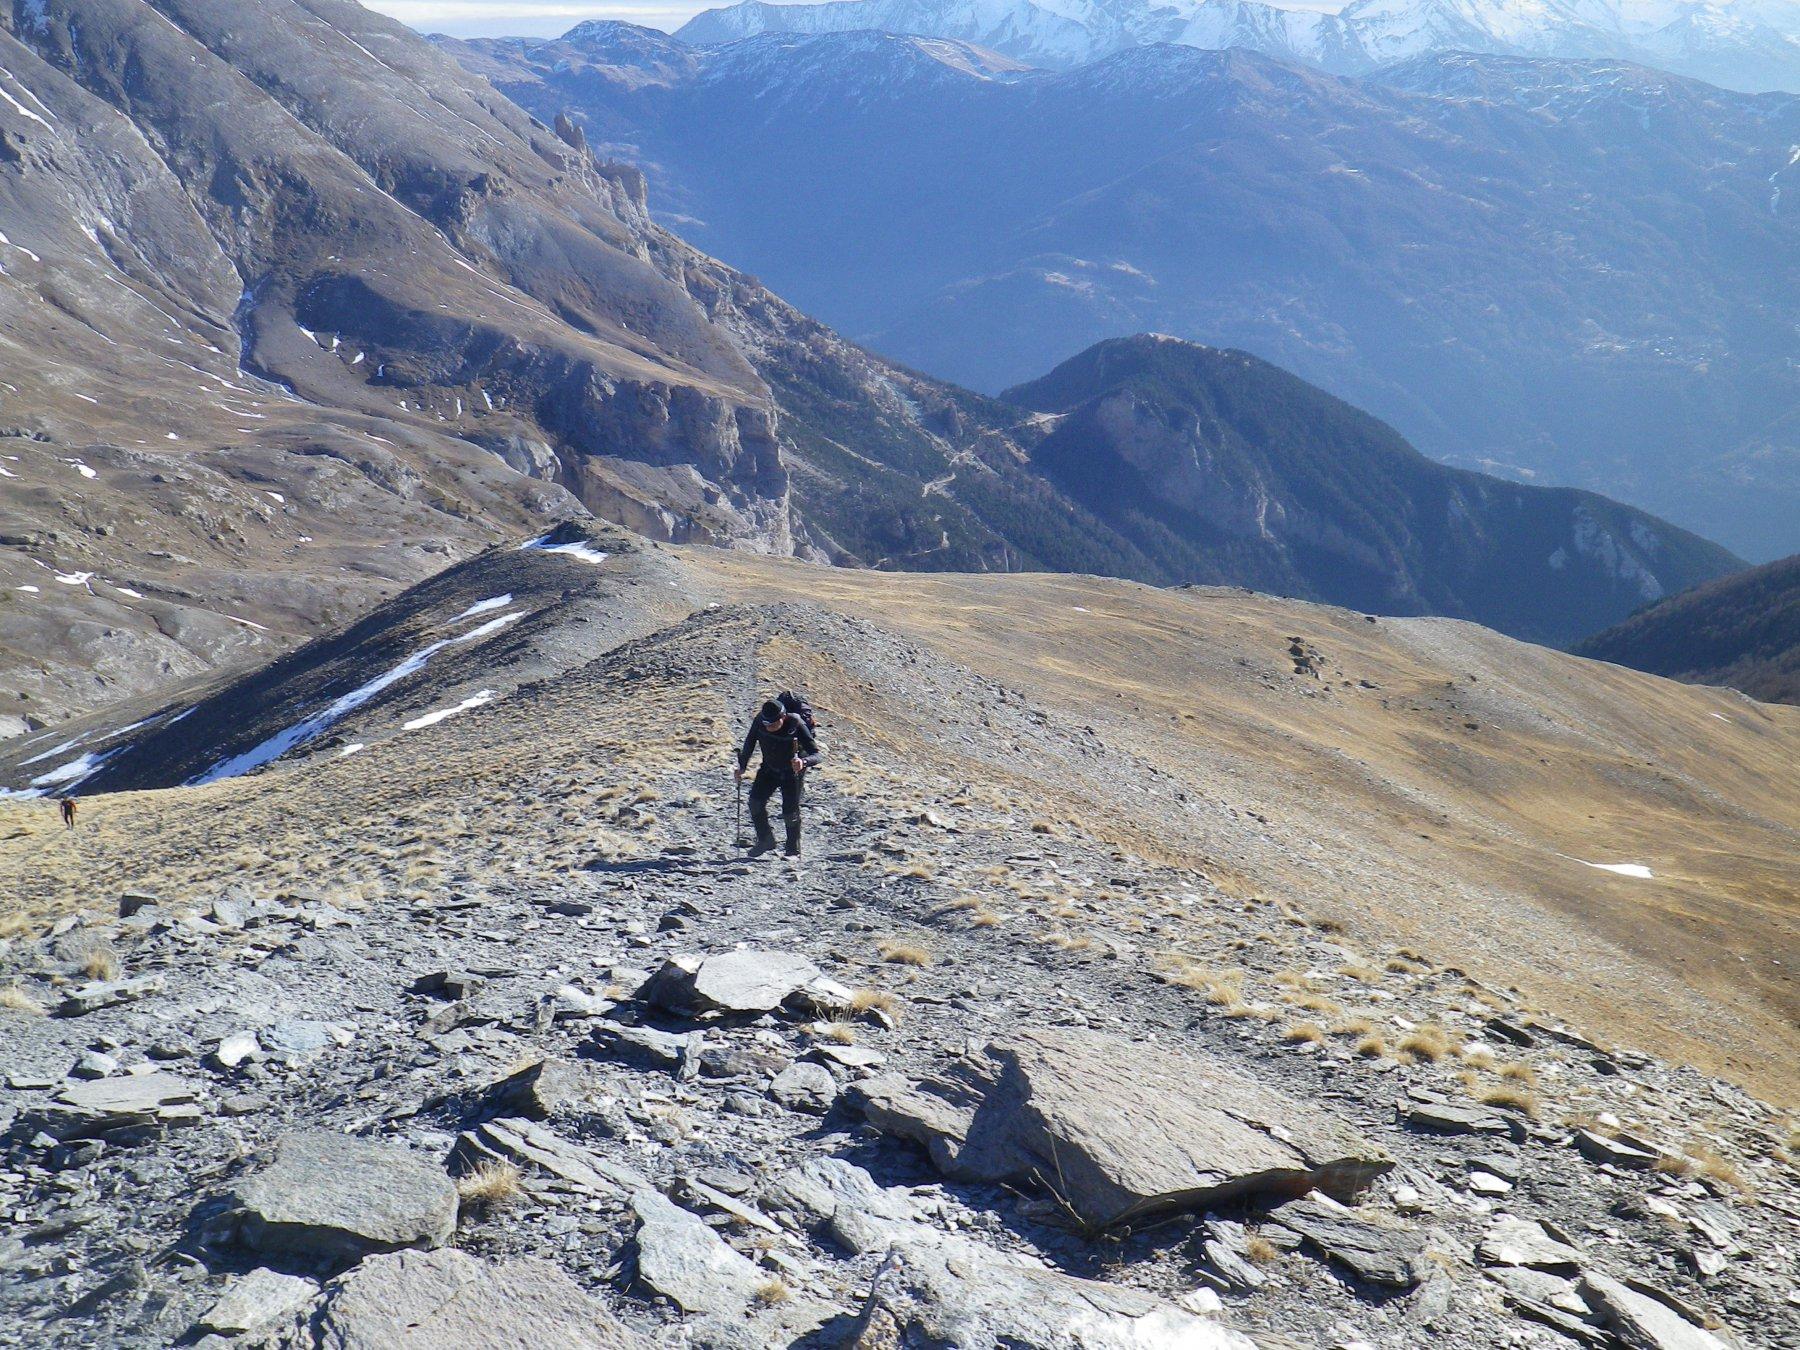 Jafferau (Monte) e Monte Vin Vert da Oulx, traversata a Bardonecchia per i Forti Pramand e Foens 2015-12-30